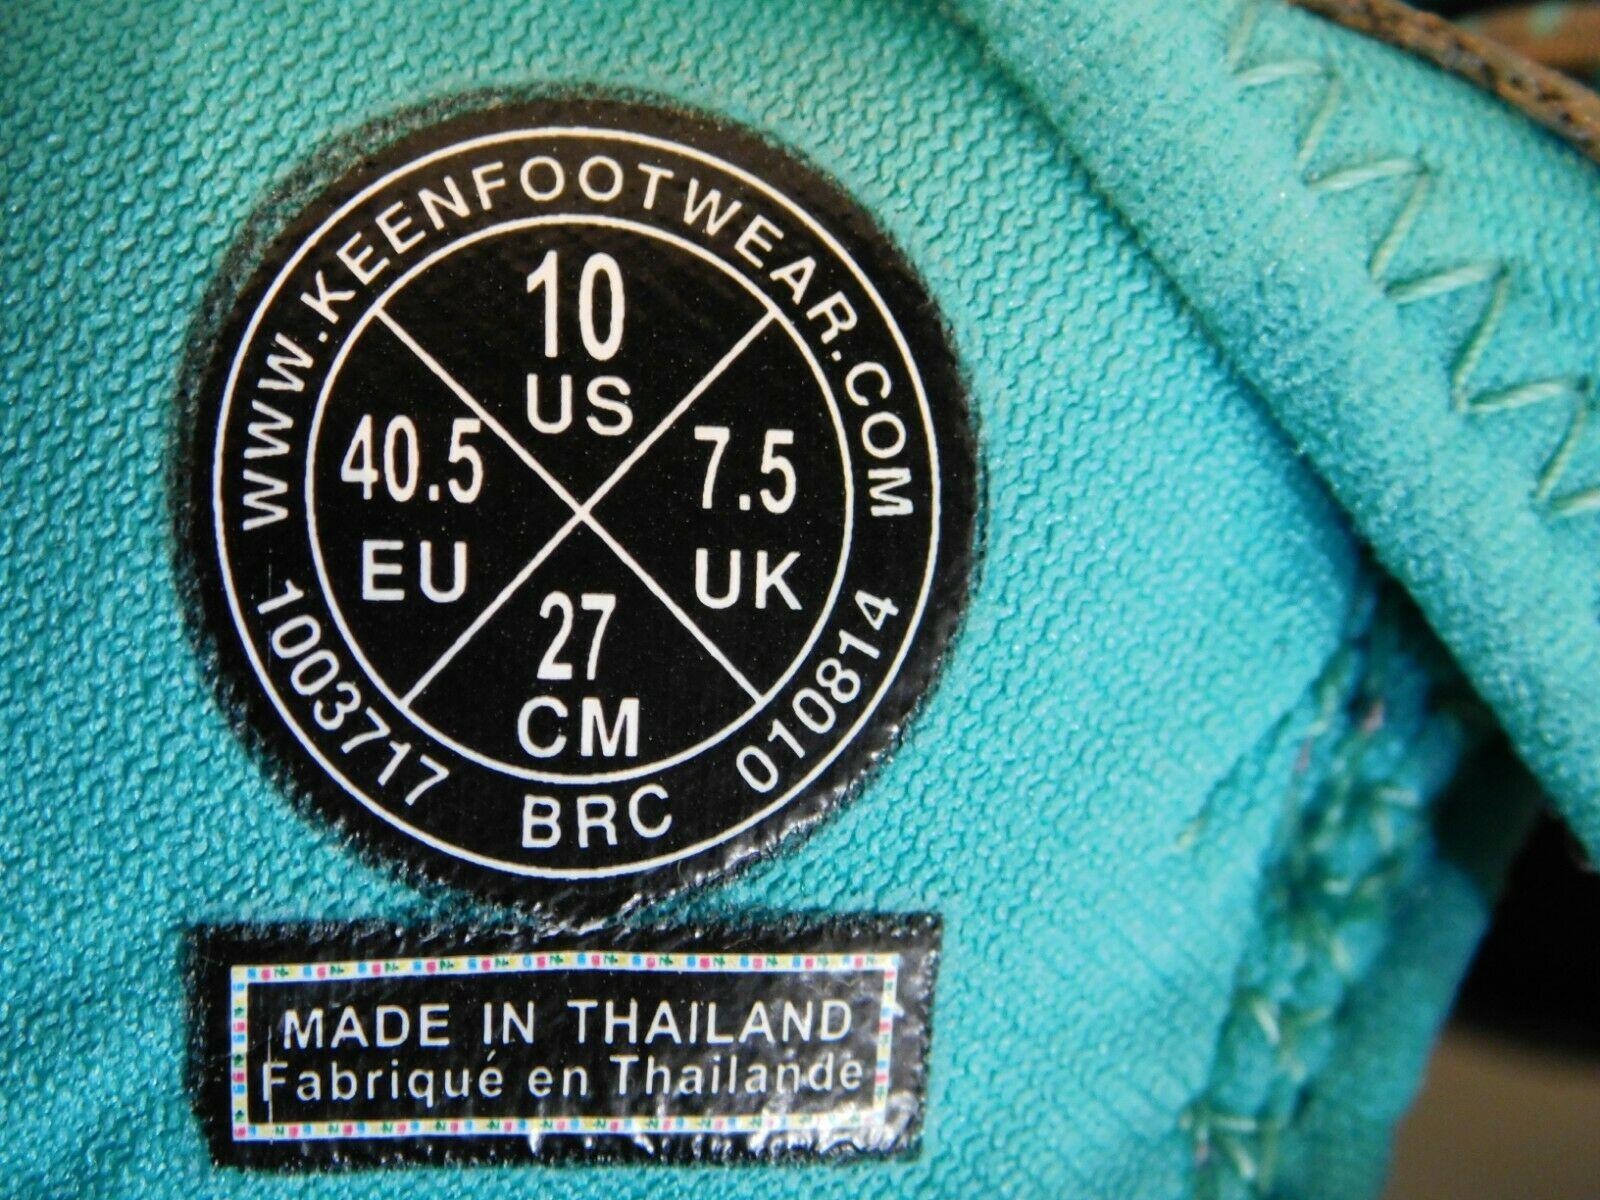 Keen Whisper Taille 10 M(B) Eu 40.5 Femmes Sport Sandales Céramique 1003717 image 7